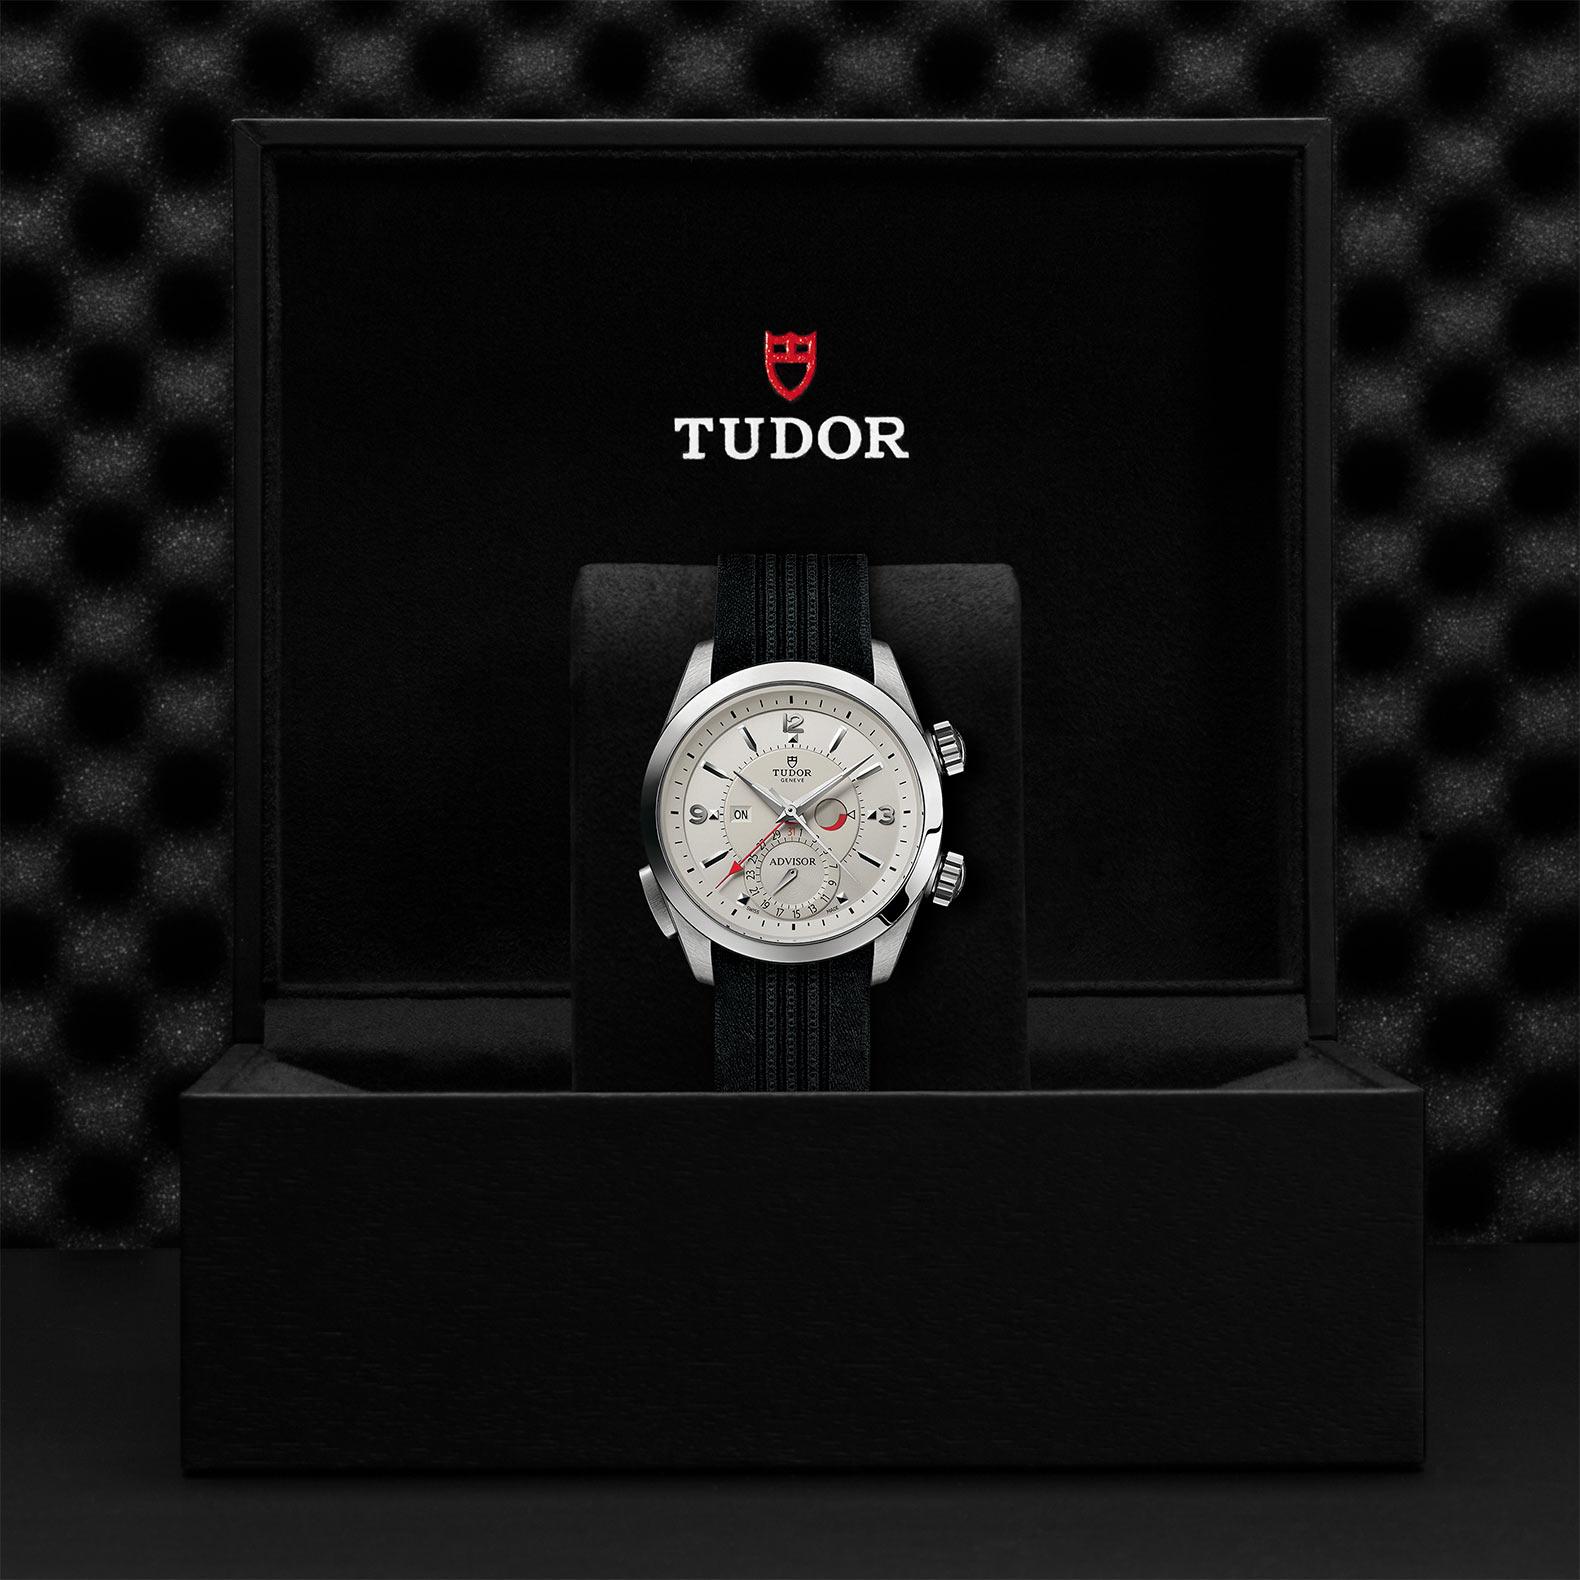 TUDOR Heritage Advisor - M79620T-0009